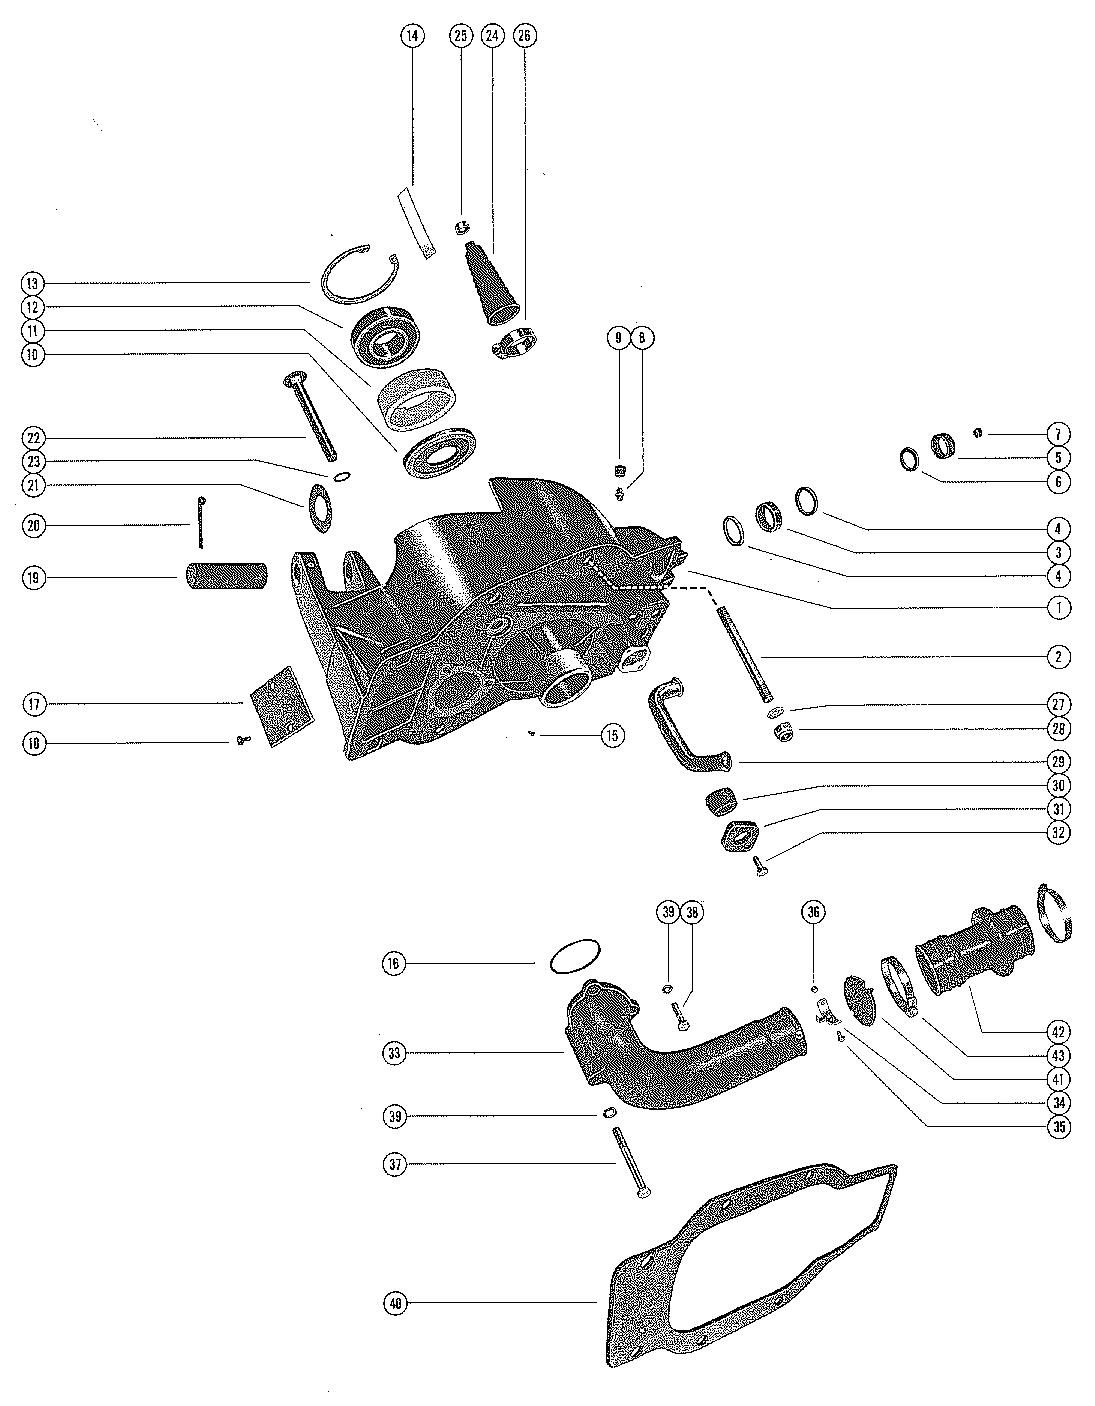 Каталог запчастей MERCRUISER остальные 120/140 1967-1969